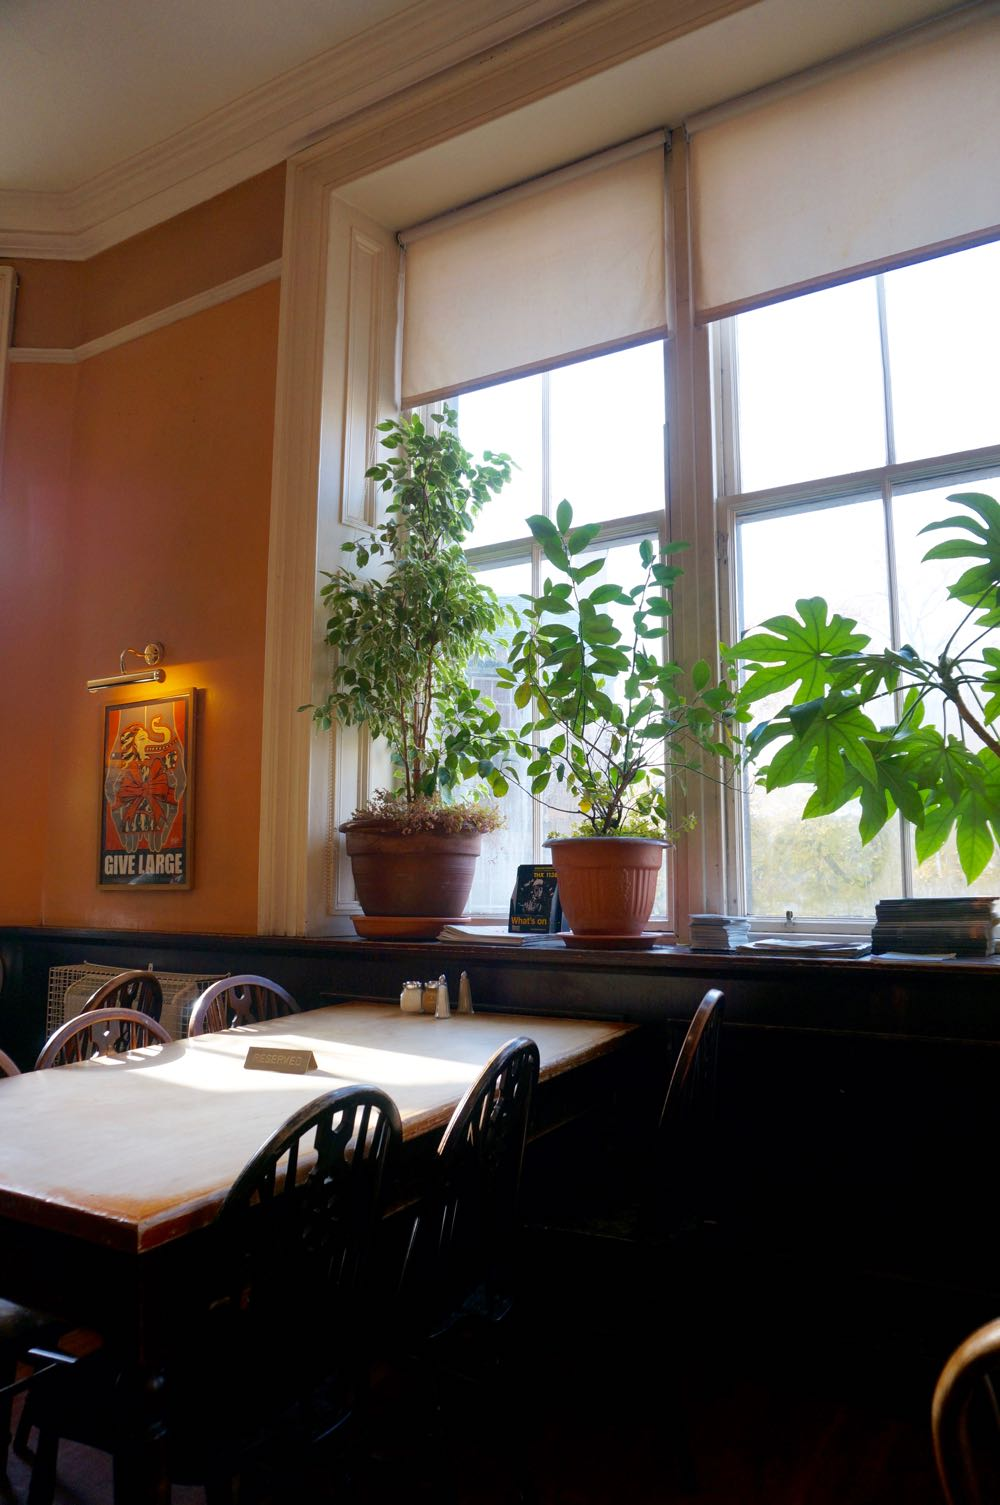 The Elephant House cafe, where JK Rowling wrote parts of Harry Potter, Edinburgh. On parentshaped.co.uk